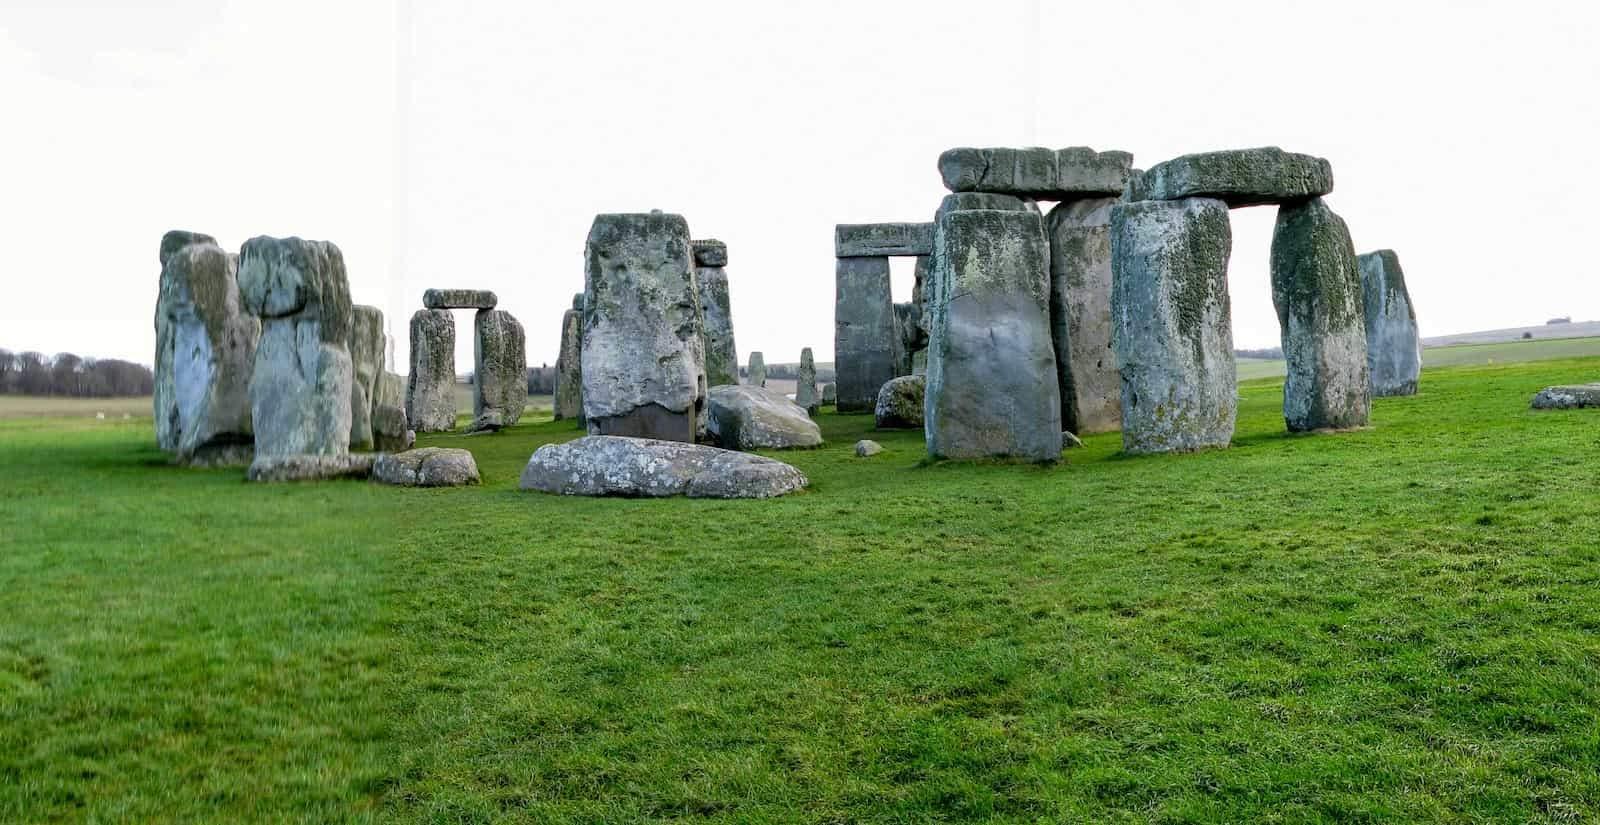 #897 Mito o realidad de Stonehenge | luisbermejo.com | podcast